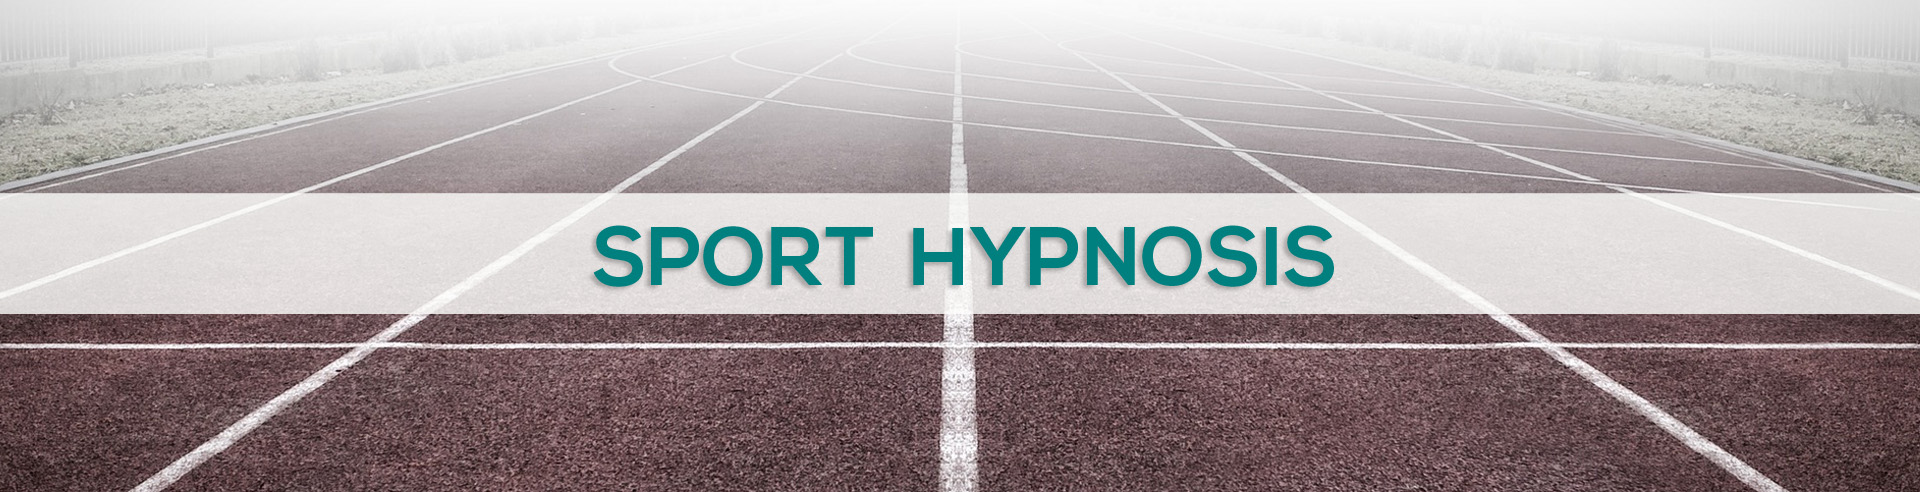 sports-hypnosis-clinic-perth.jpg (1920×492)